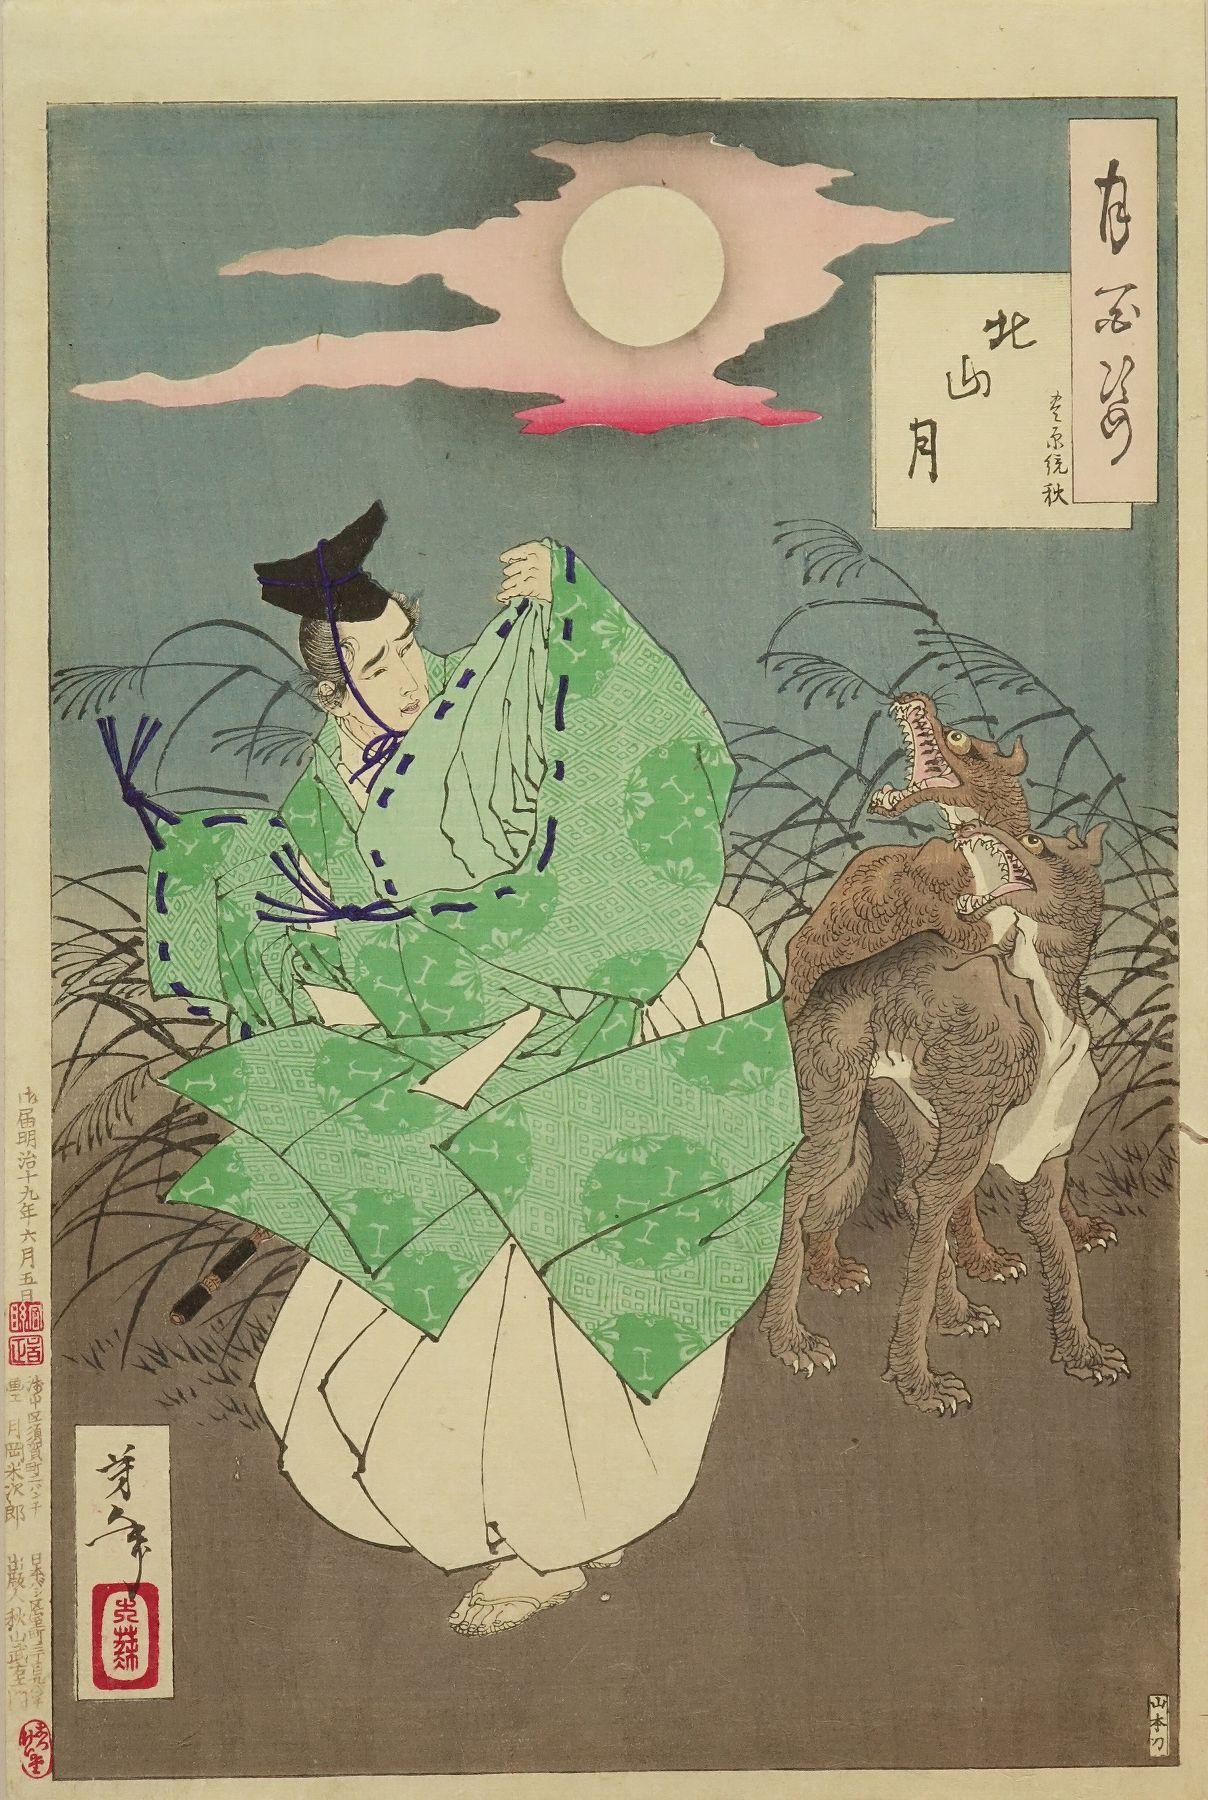 YOSHITOSHI Kitayama Moon, Toyohara Sumaki, from <i>Tsuki hyakushi</i> (One hundred aspects of the moon)